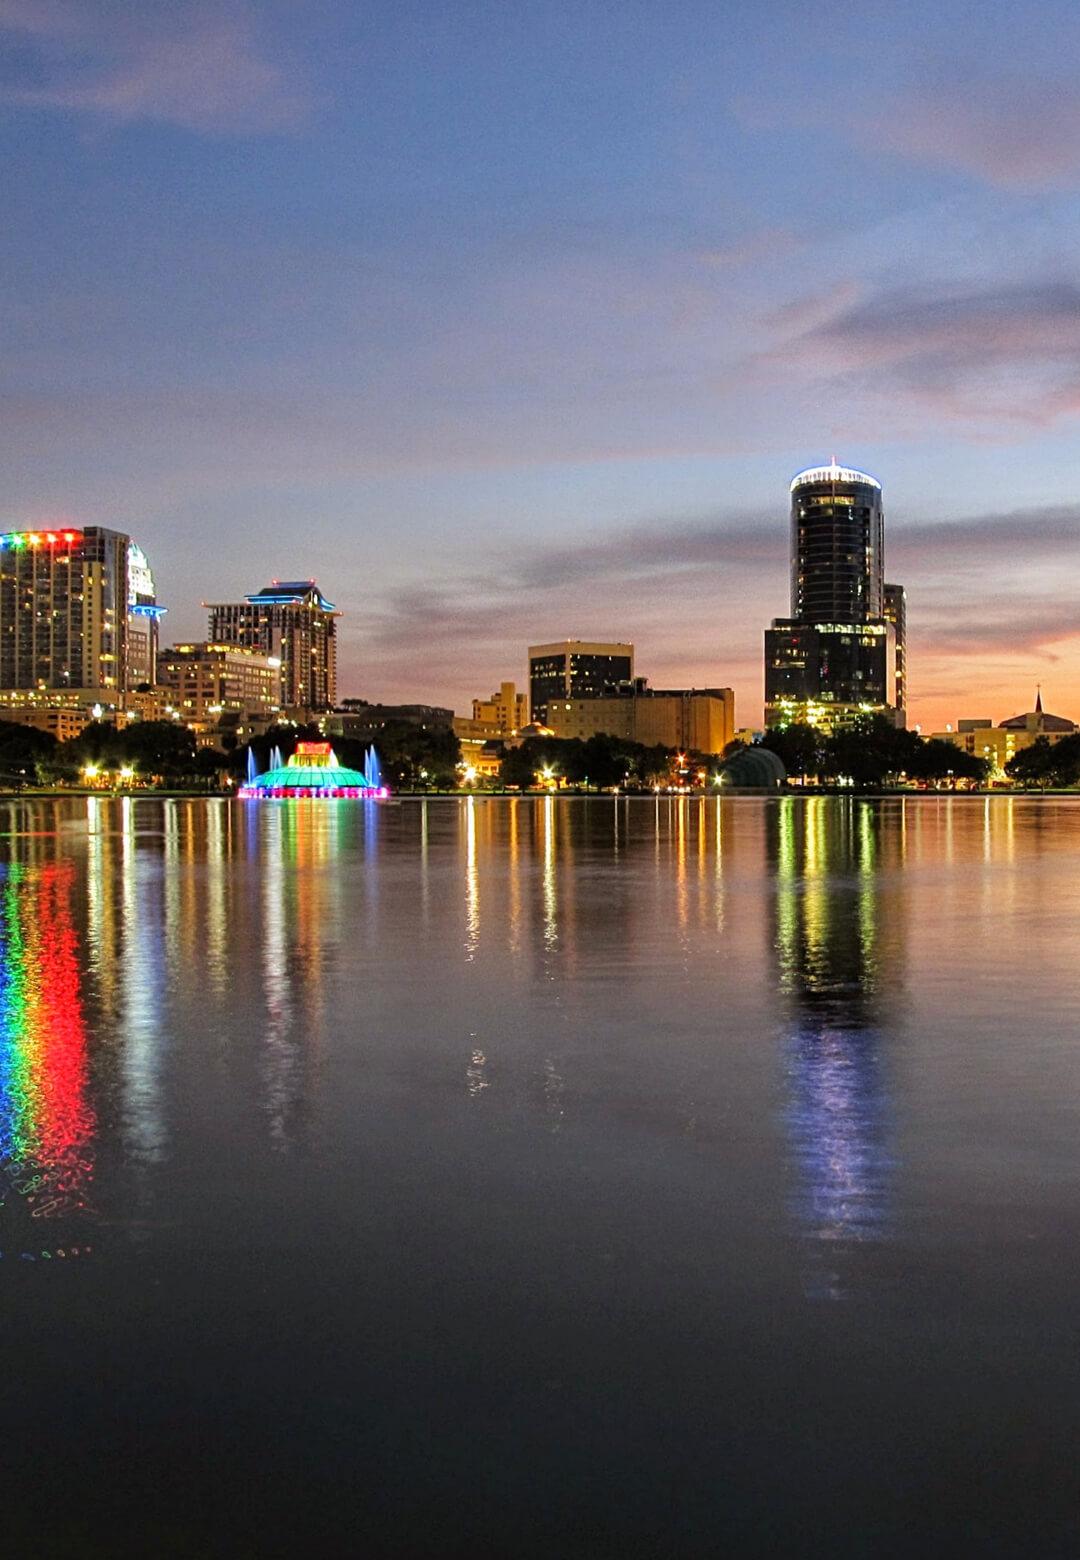 Lake Eola Park in Downtown Orlando, Florida | Orlando in Florida | STIRworld